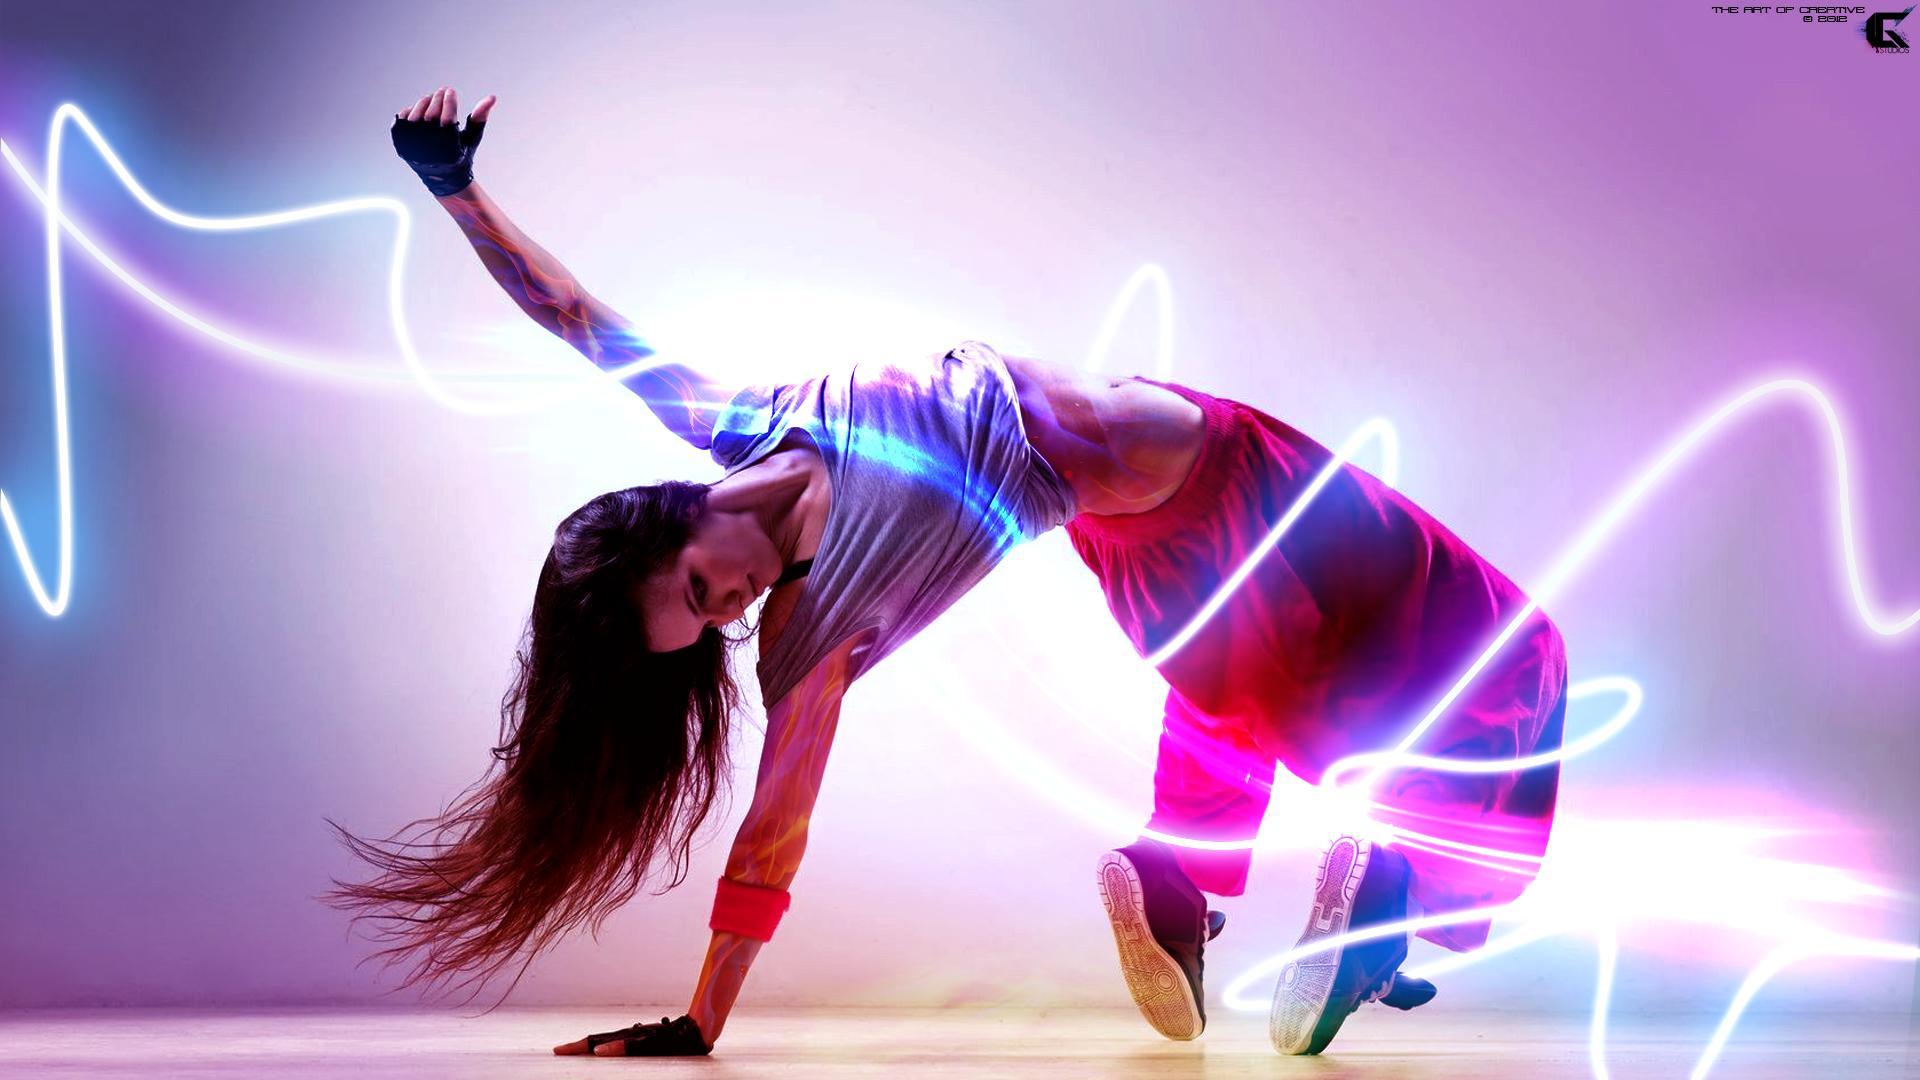 dance wallpaper cool girl - photo #9